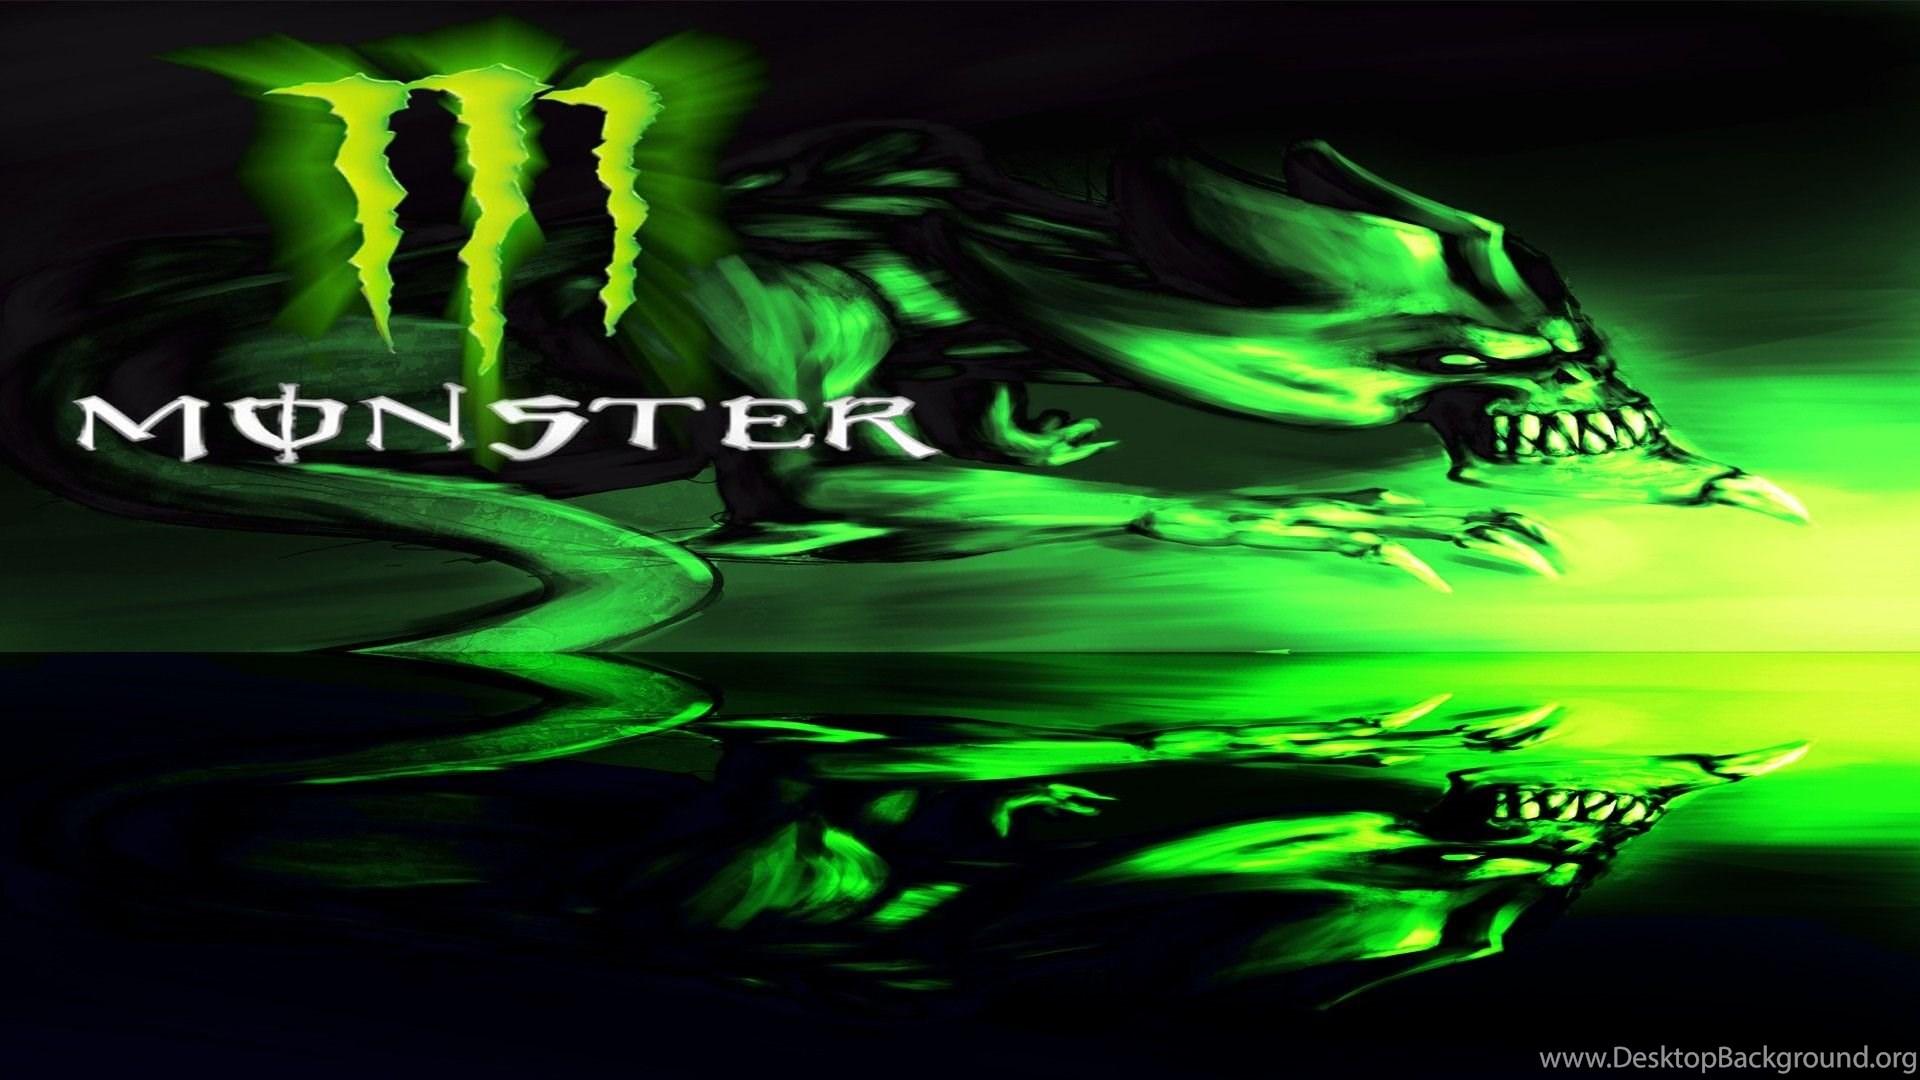 Monster energy wallpaperg desktop background popular voltagebd Choice Image